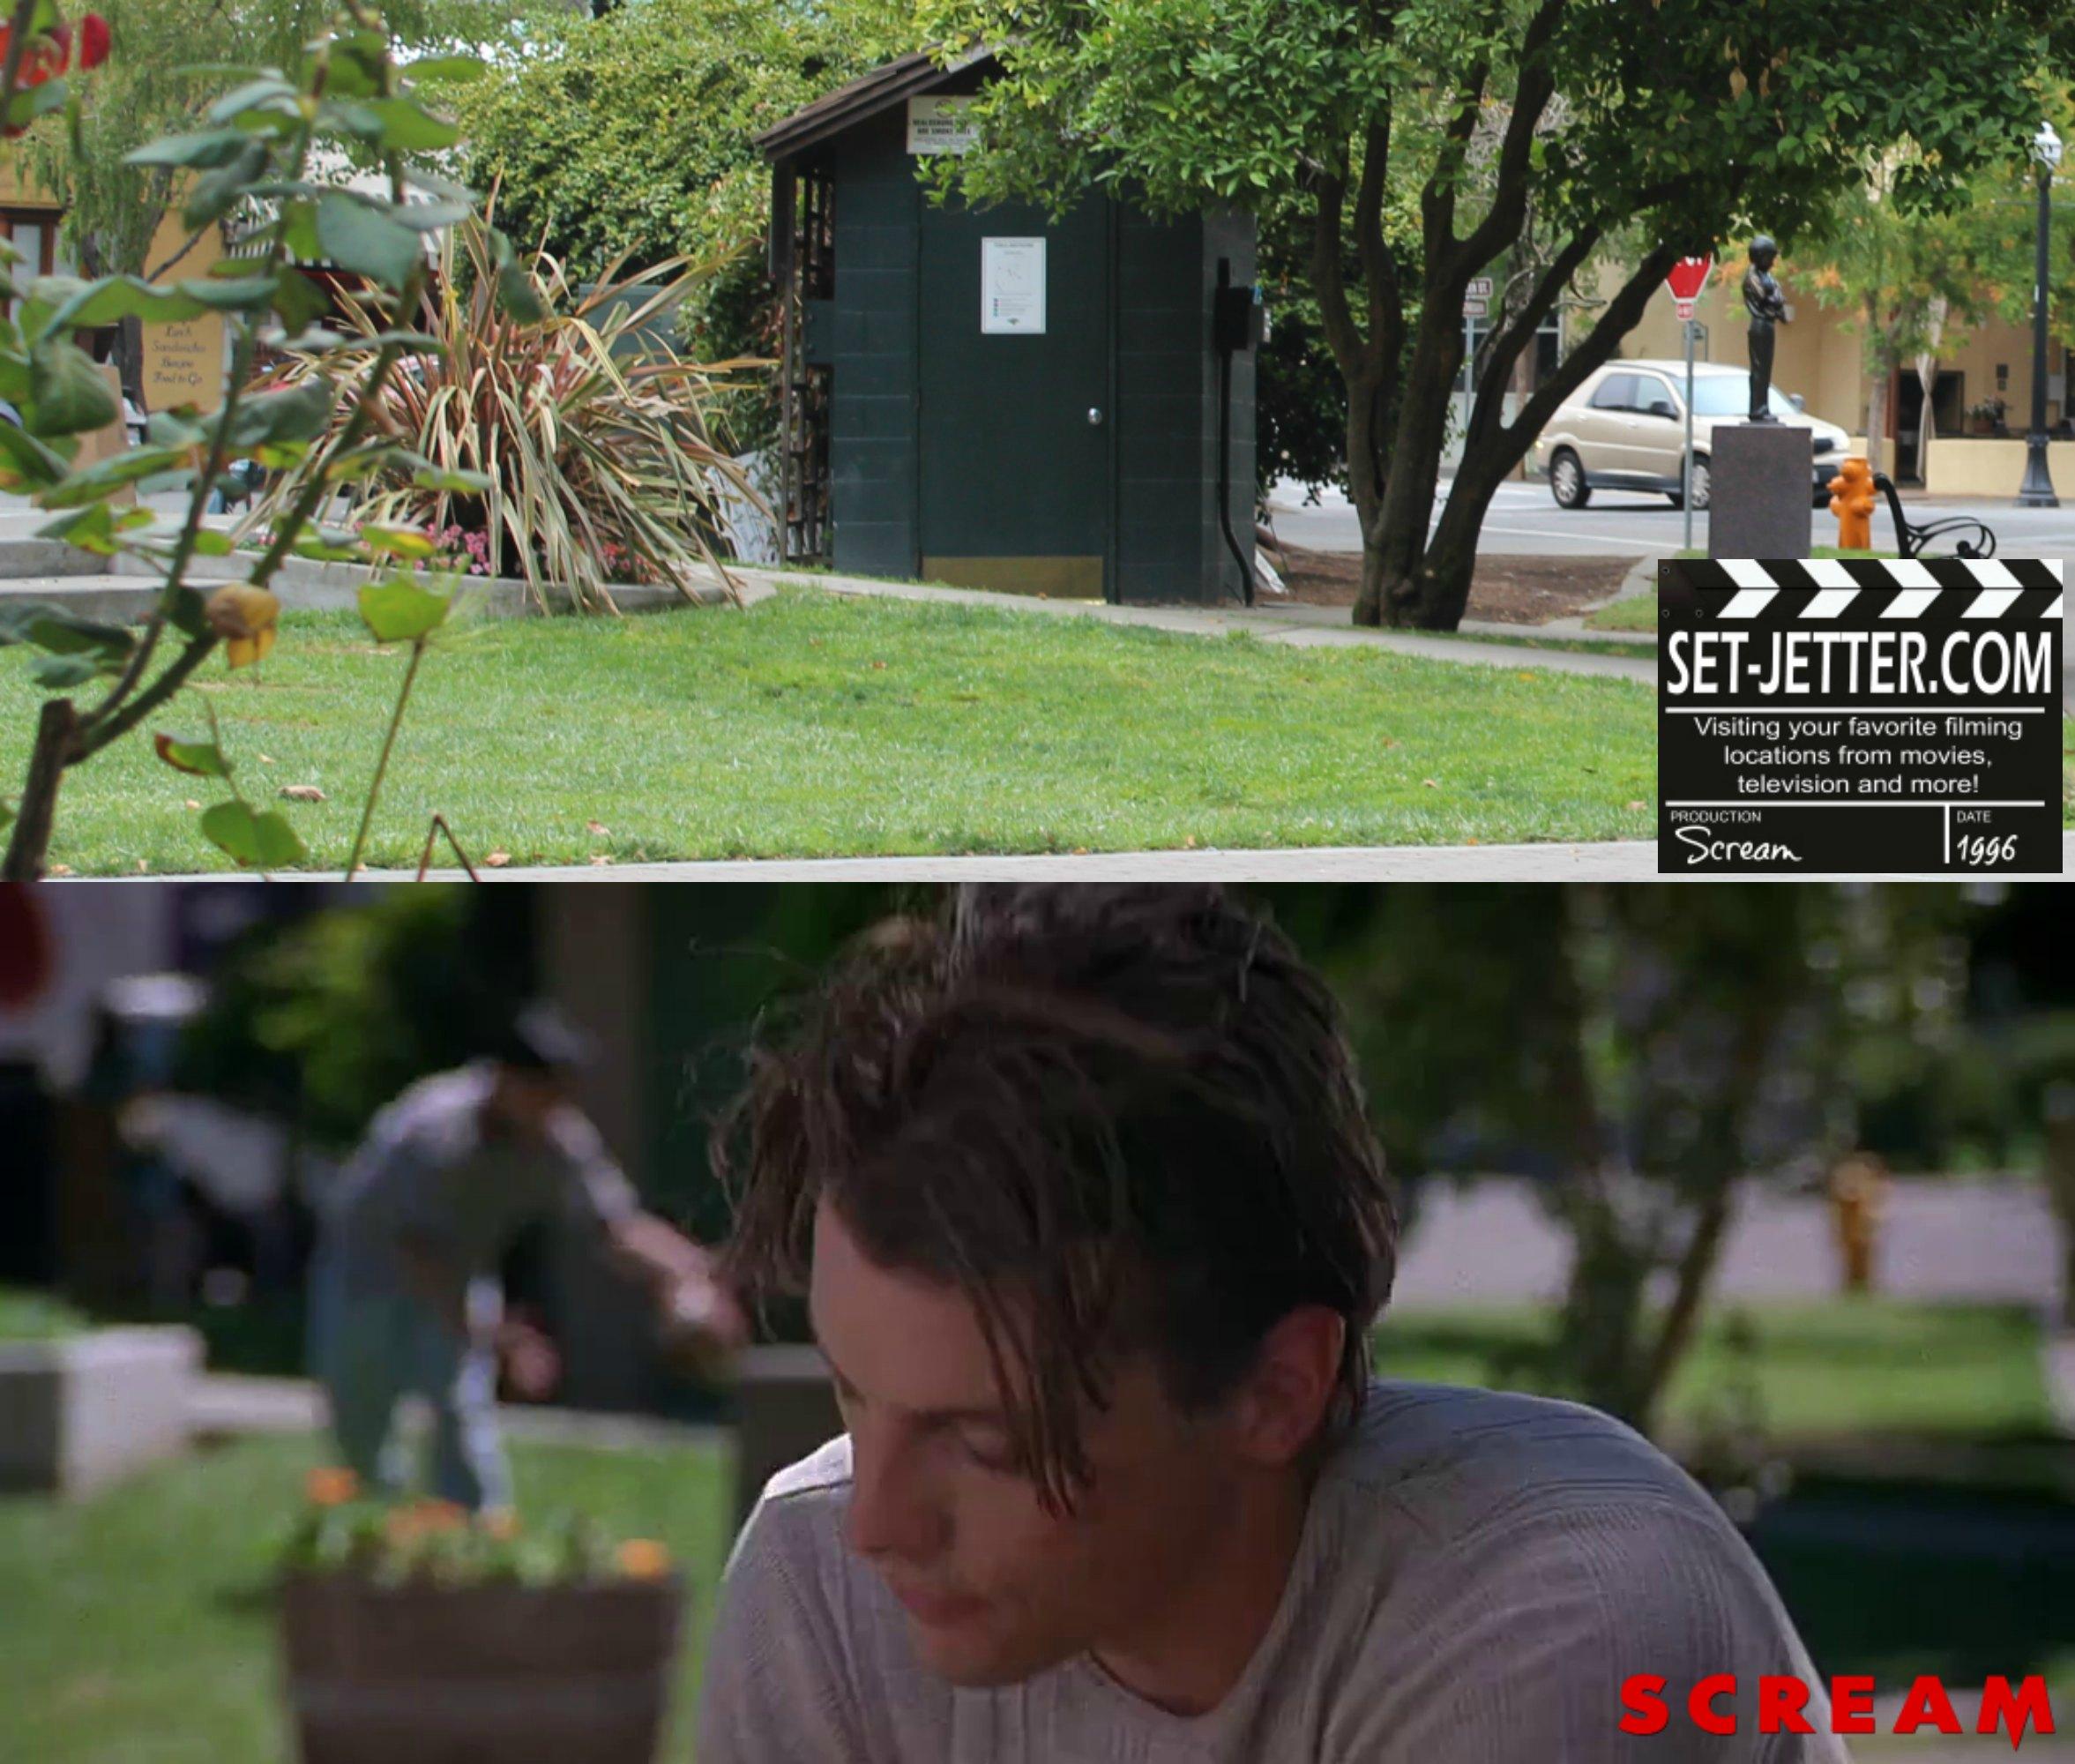 Scream comparison 39.jpg